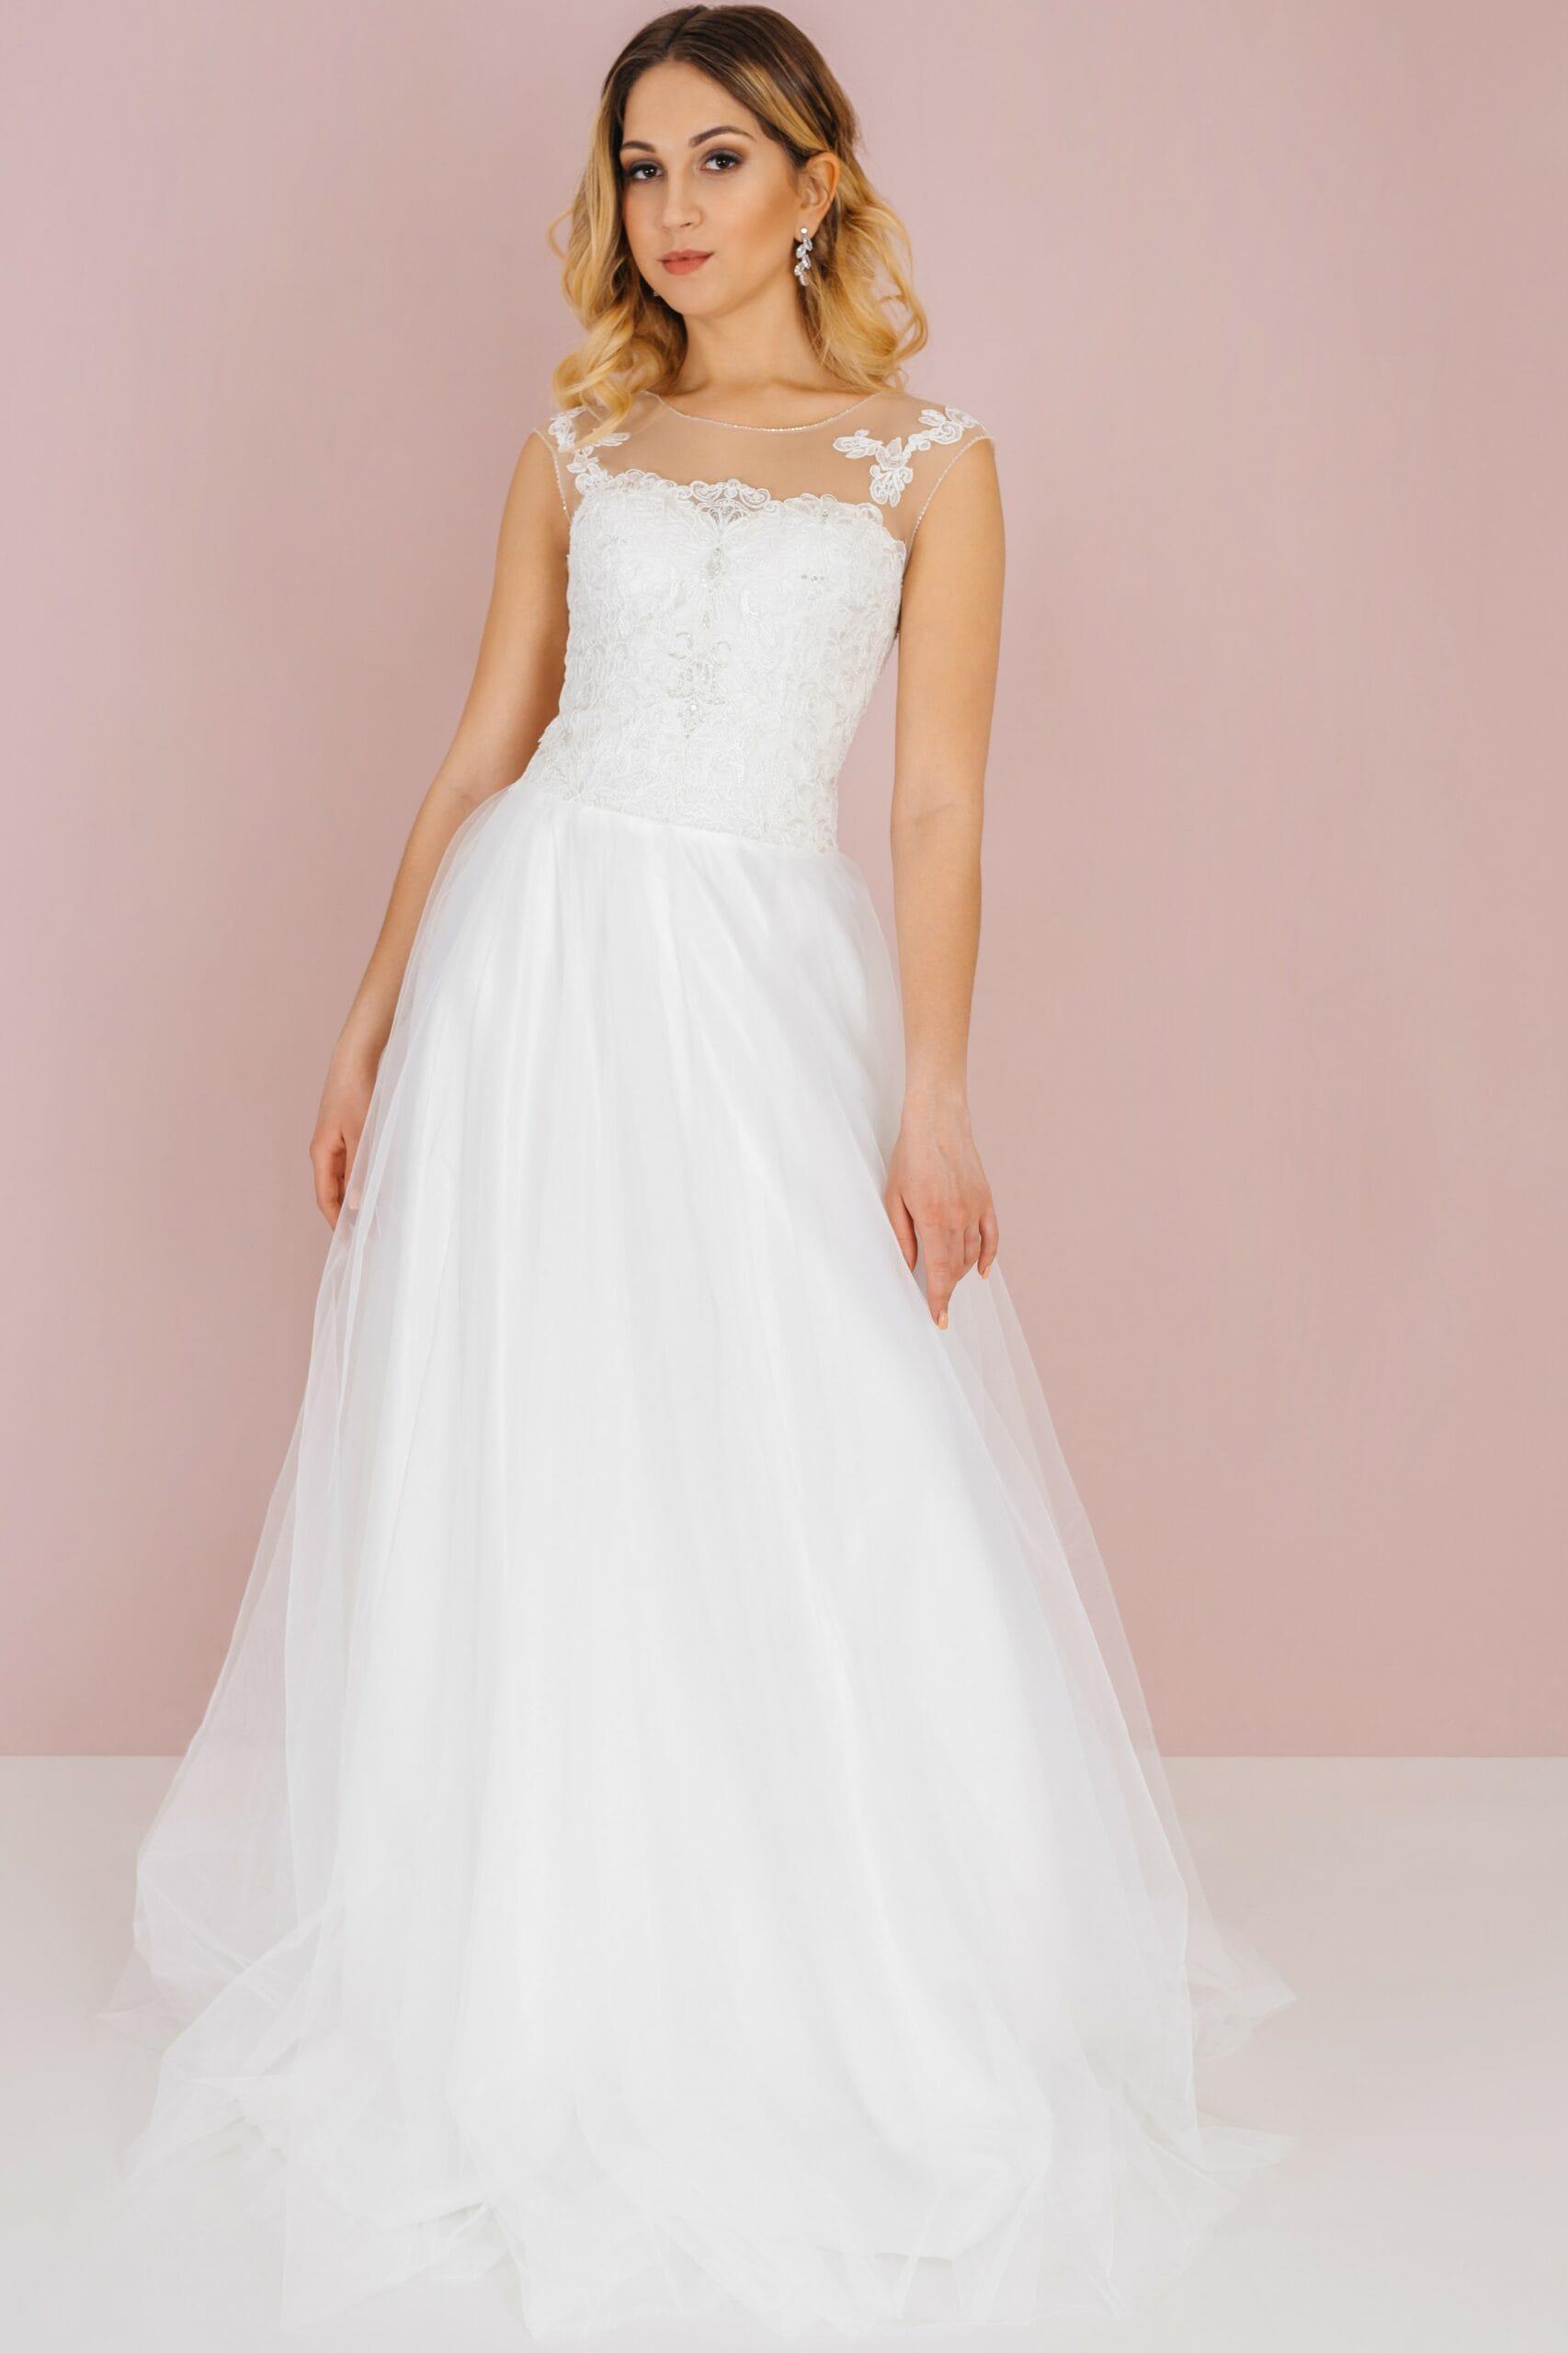 Свадебное платье MIA, коллекция LOFT, бренд RARE BRIDAL, фото 1